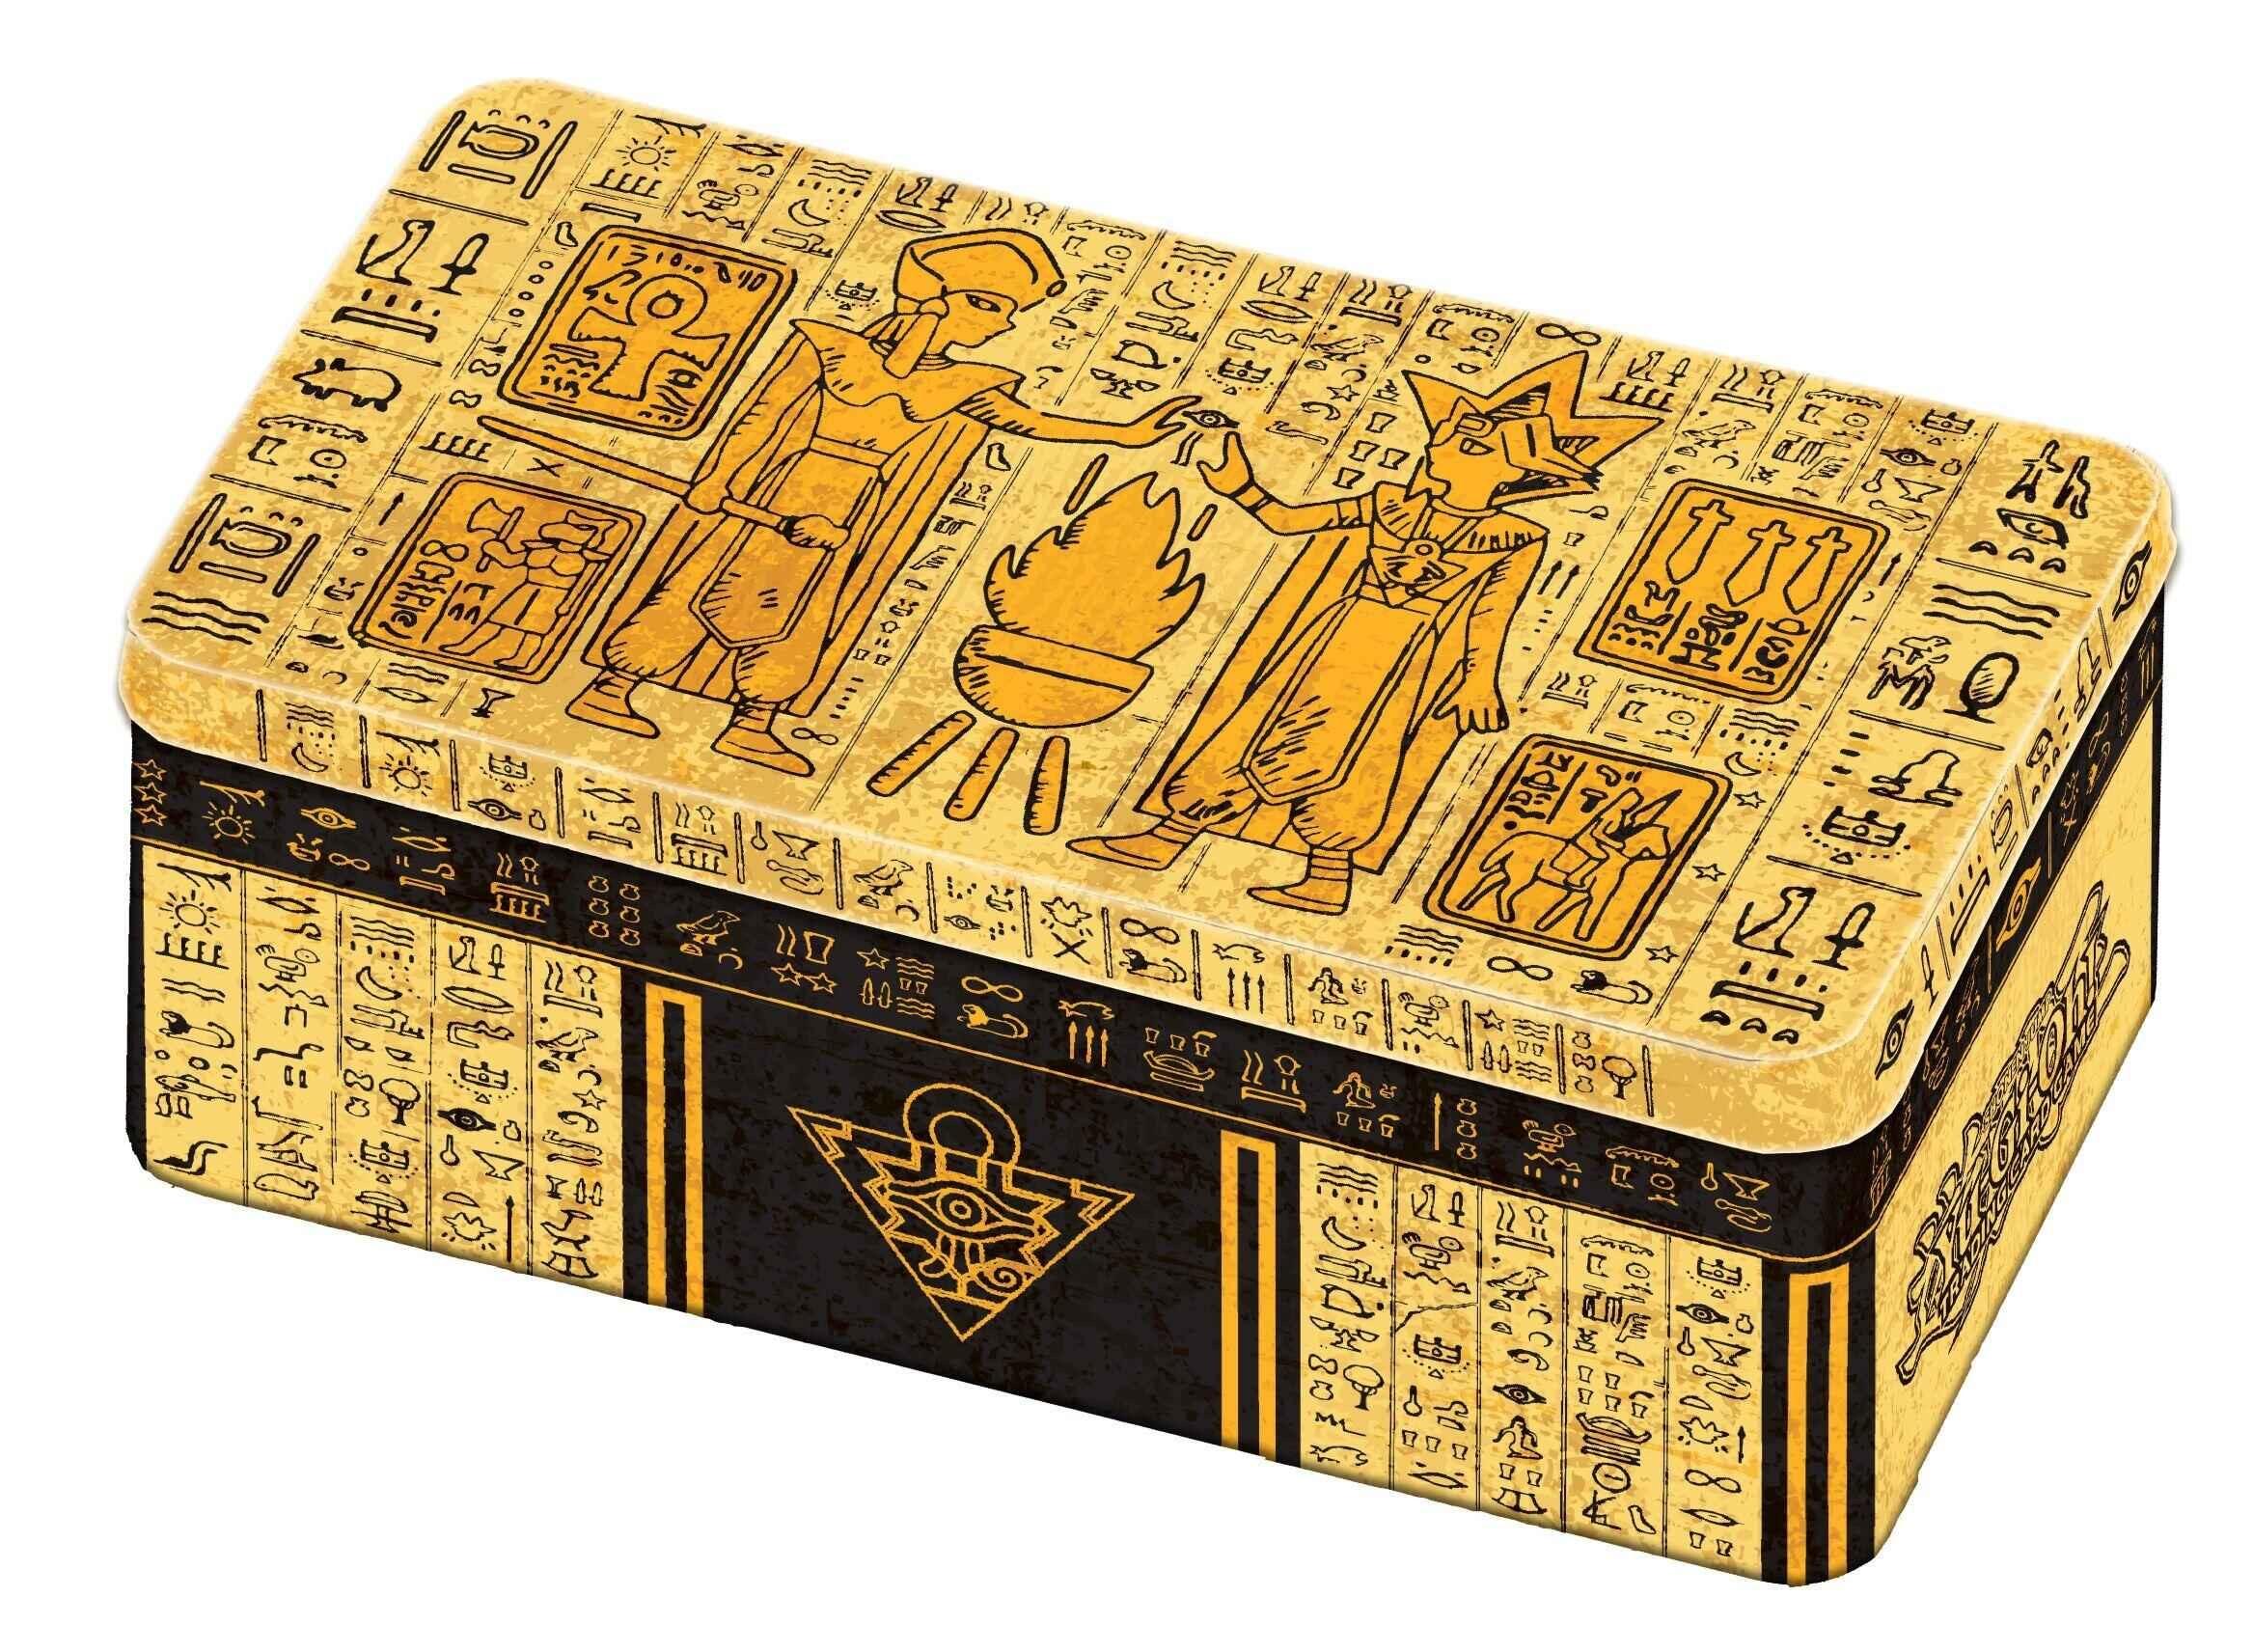 Yu-Gi-Oh MP19 / MP20 Gold Tin Box 2020 Tin And 2019 Tin Genuine English Original Box Spot